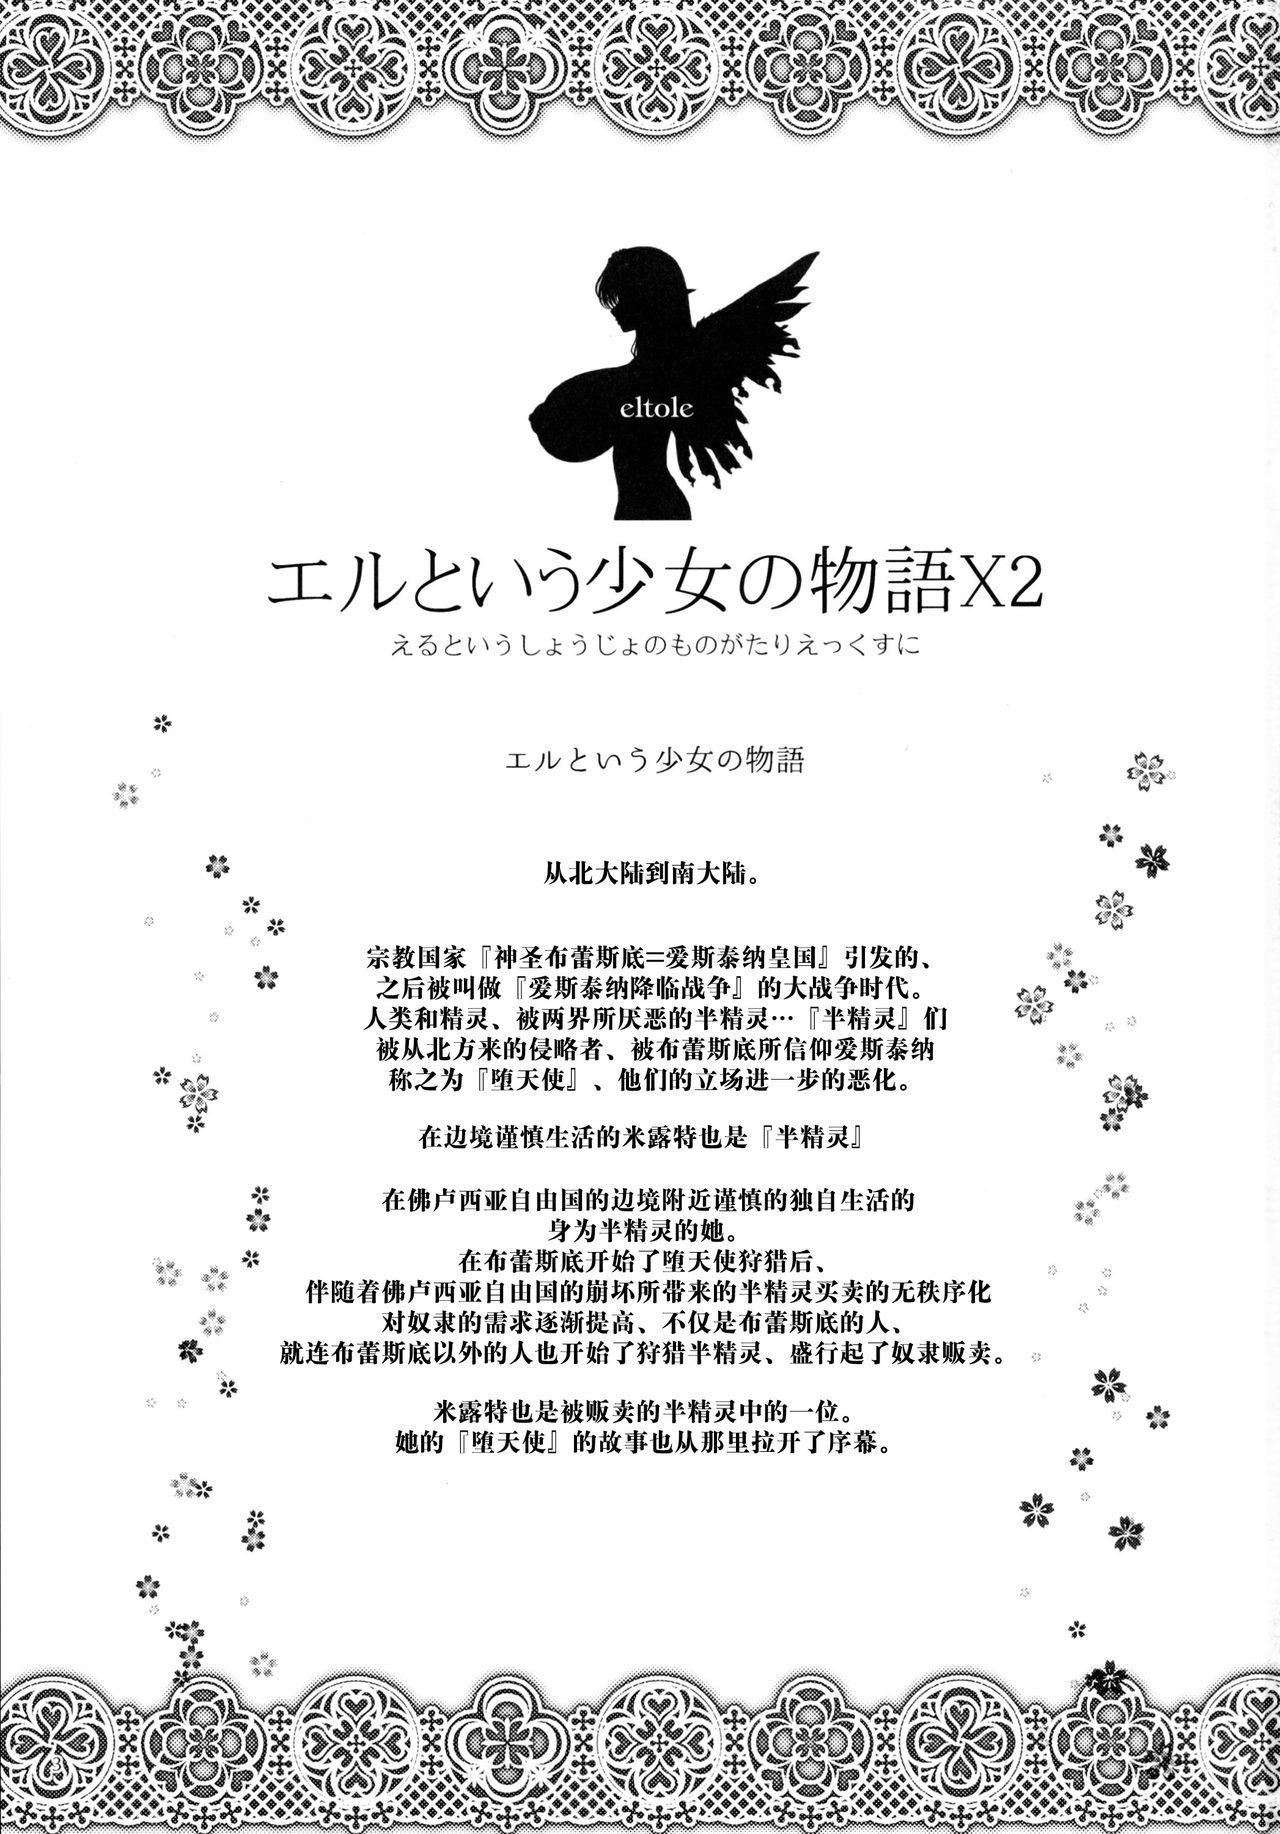 El toiu Shoujo no Monogatari X2 2